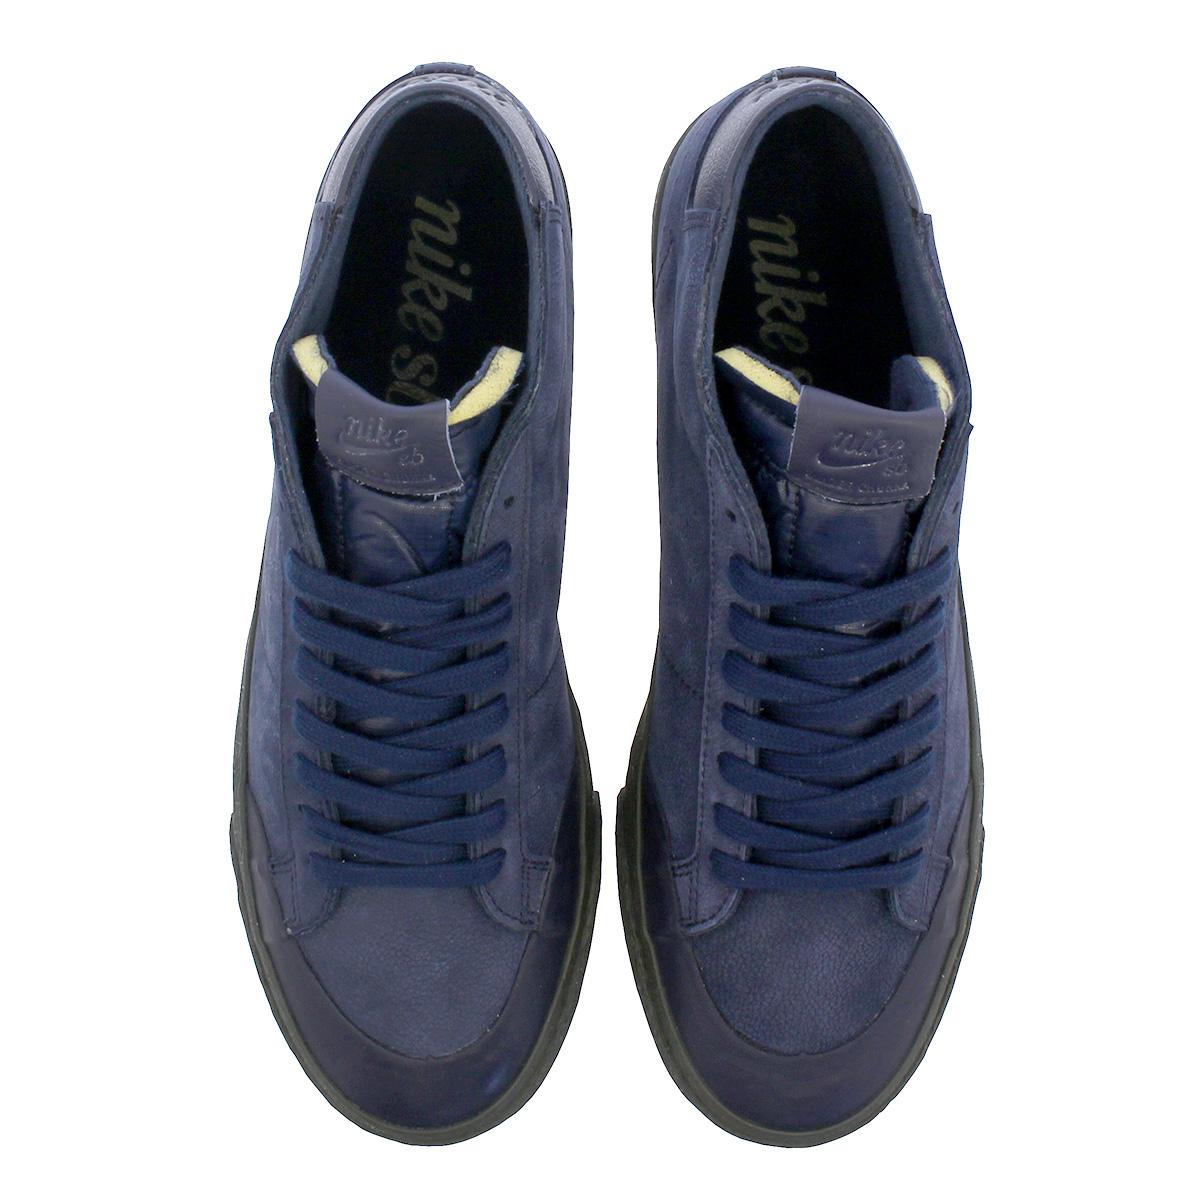 69cf3c59a5fe1 NIKE SB ZOOM BLAZER CHUKKA XT PRM Nike SB ズームブレザーチャッカ XT premium OBSIDIAN  av3529-440